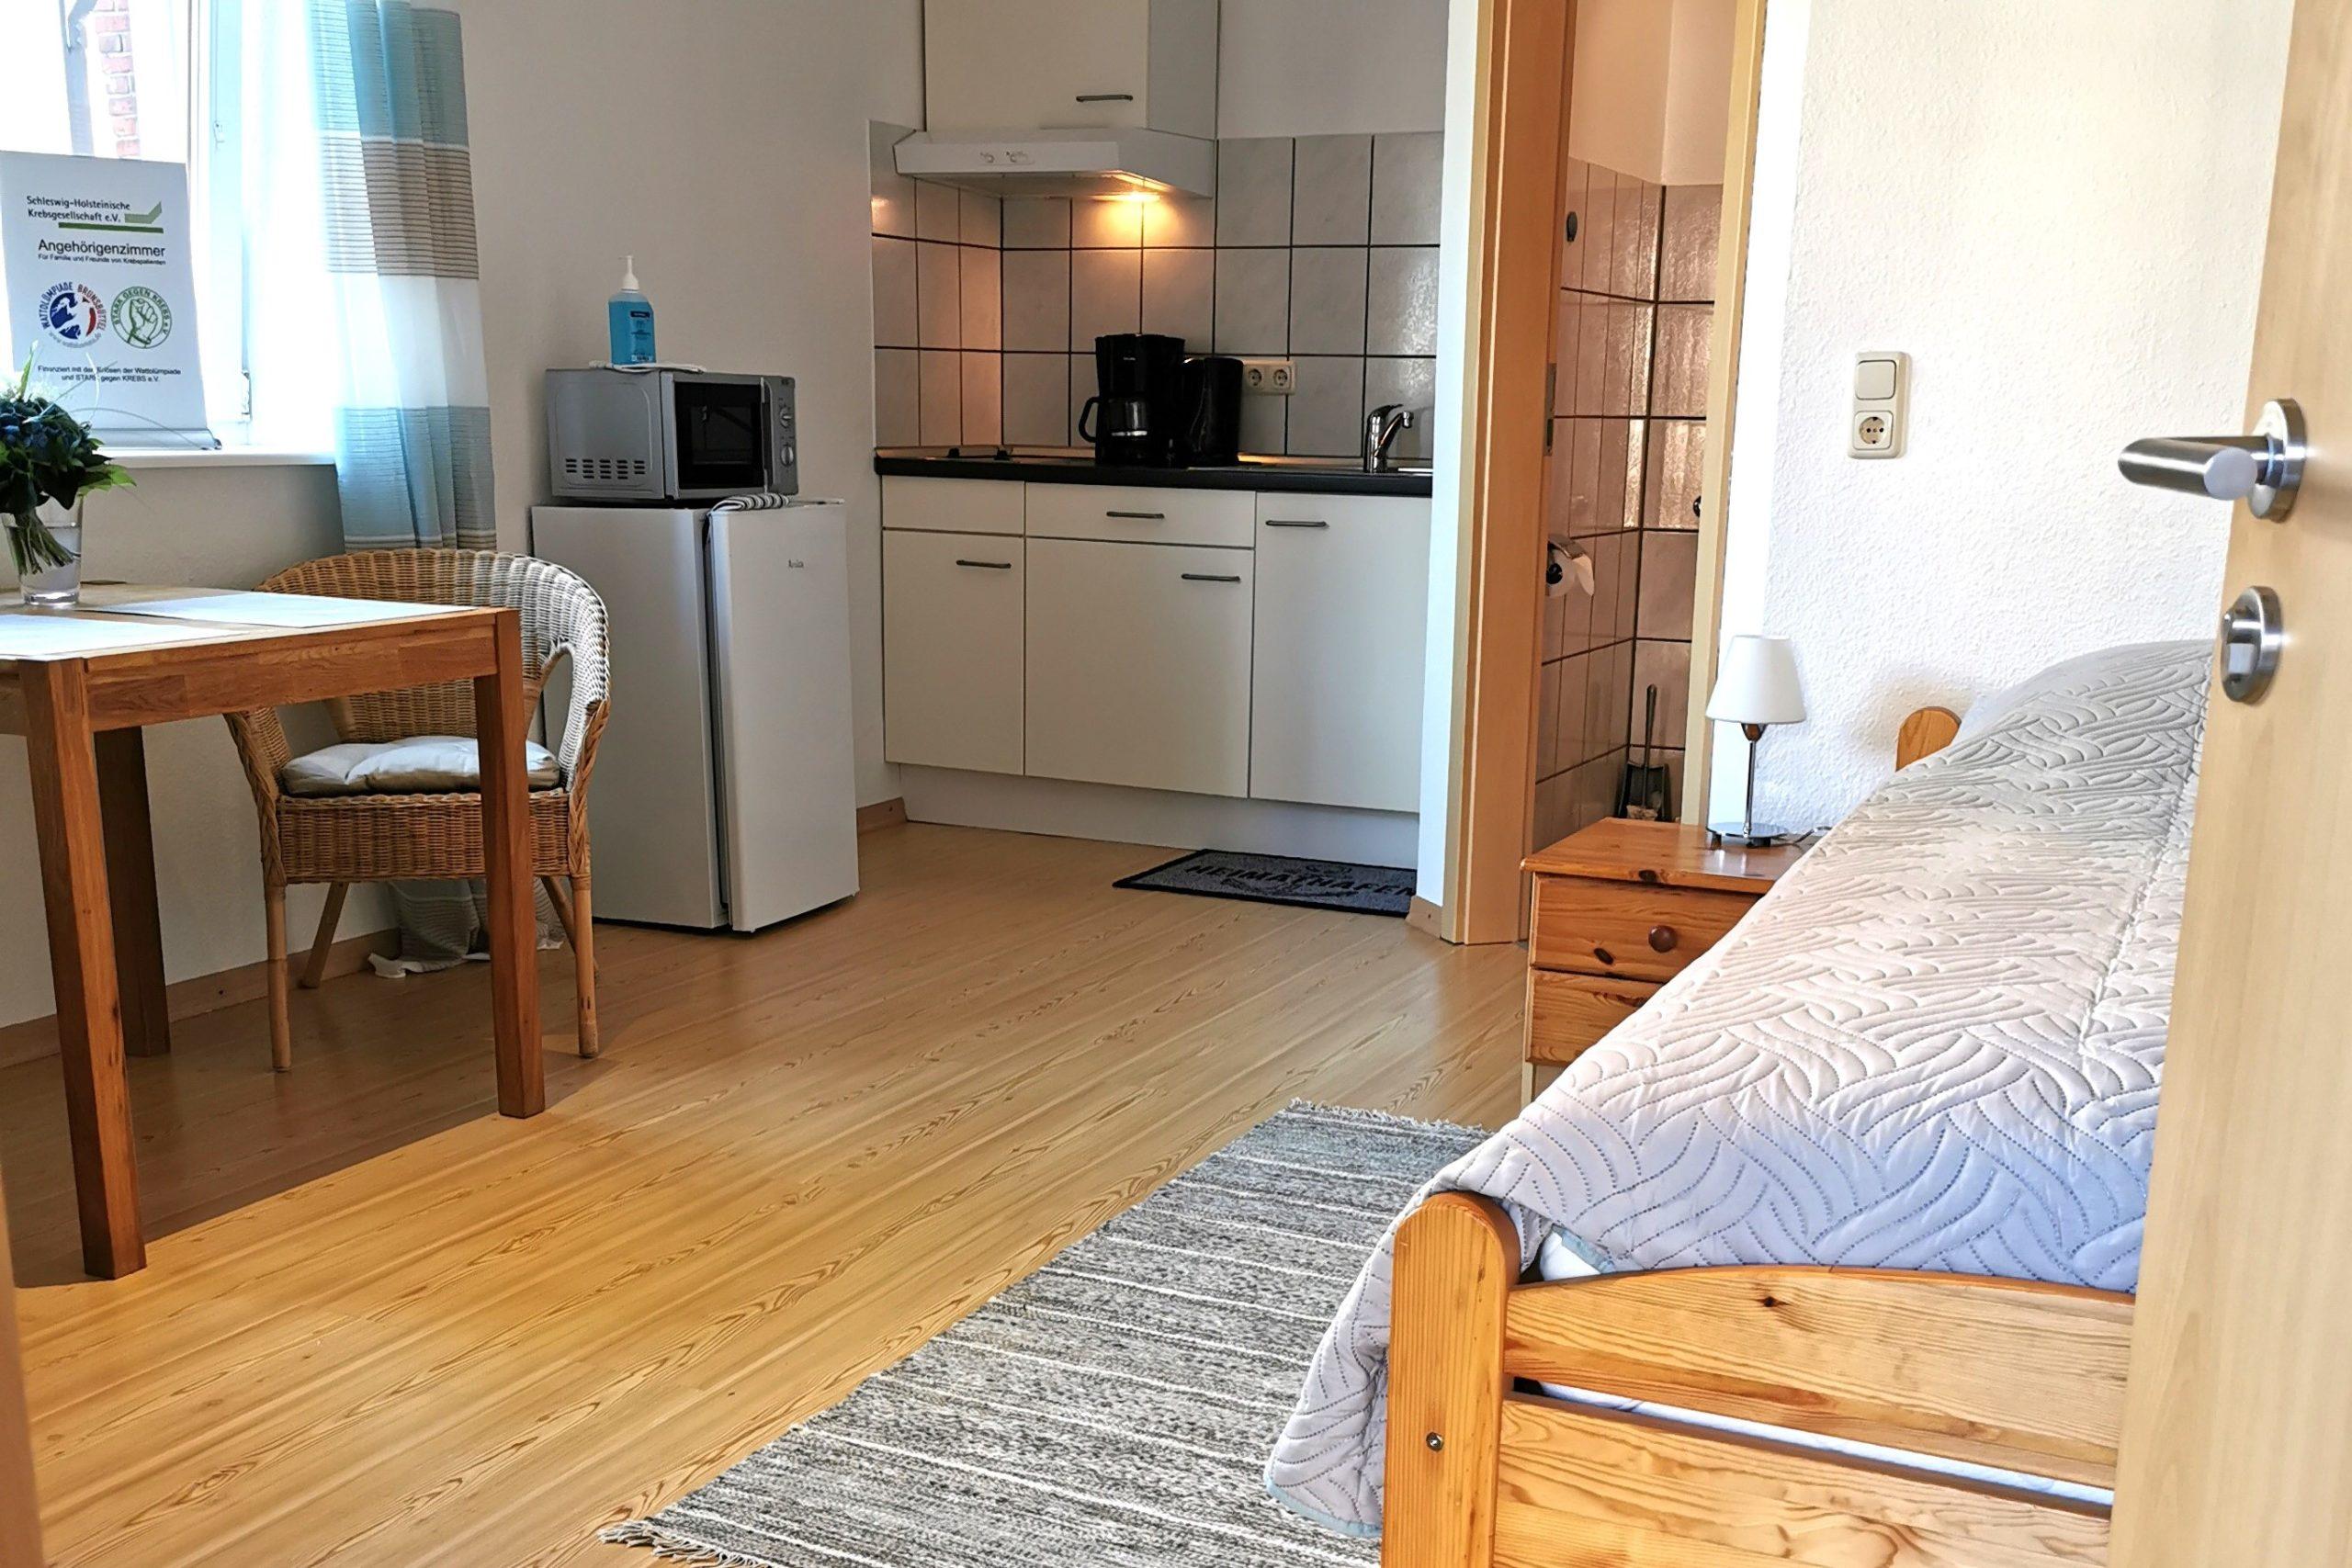 Neues Angehörigenzimmer In Brunsbüttel Eröffnet